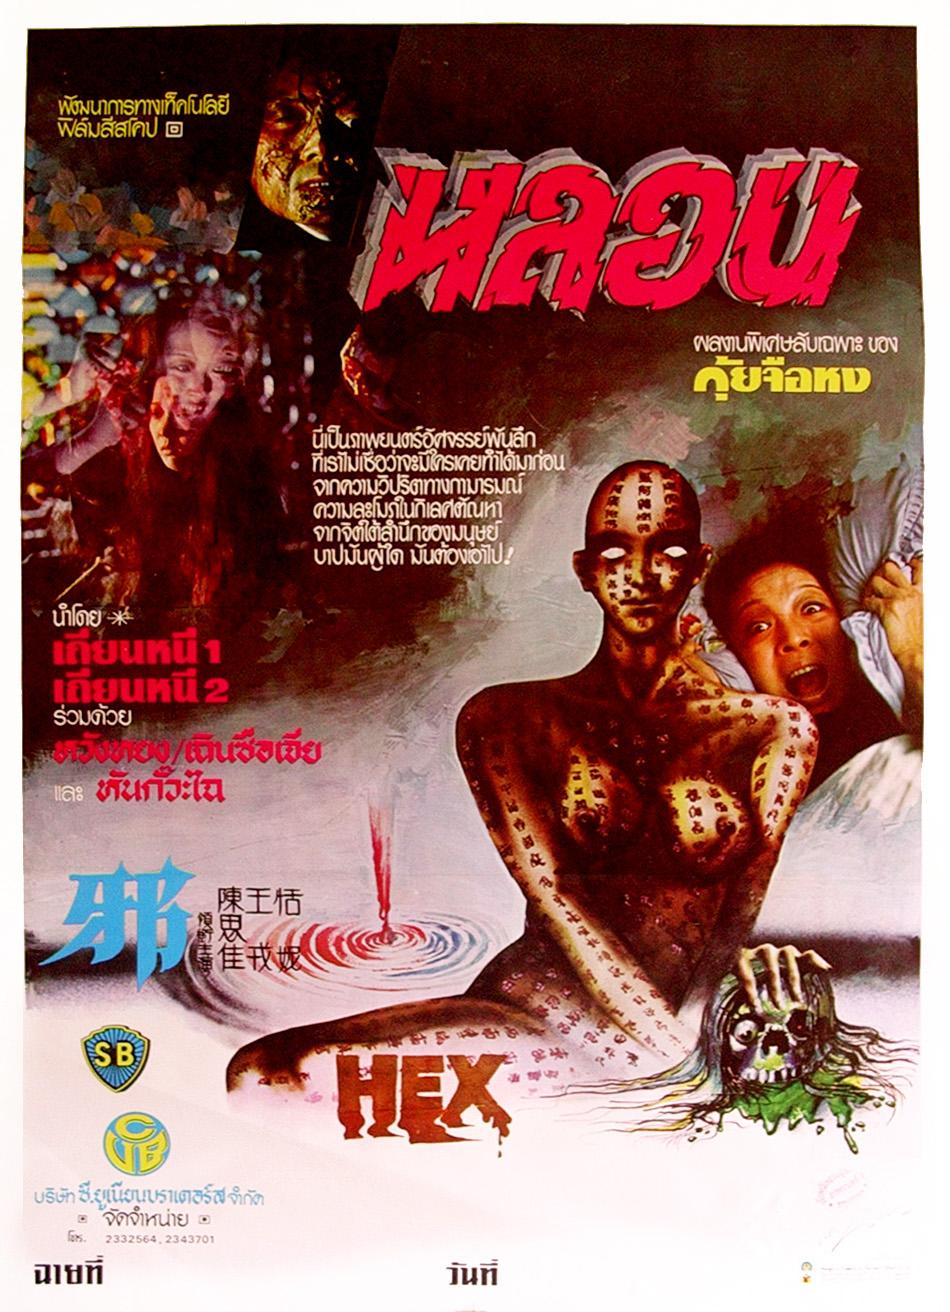 Mobfix Patrol, 1980 (Thai Film Poster)